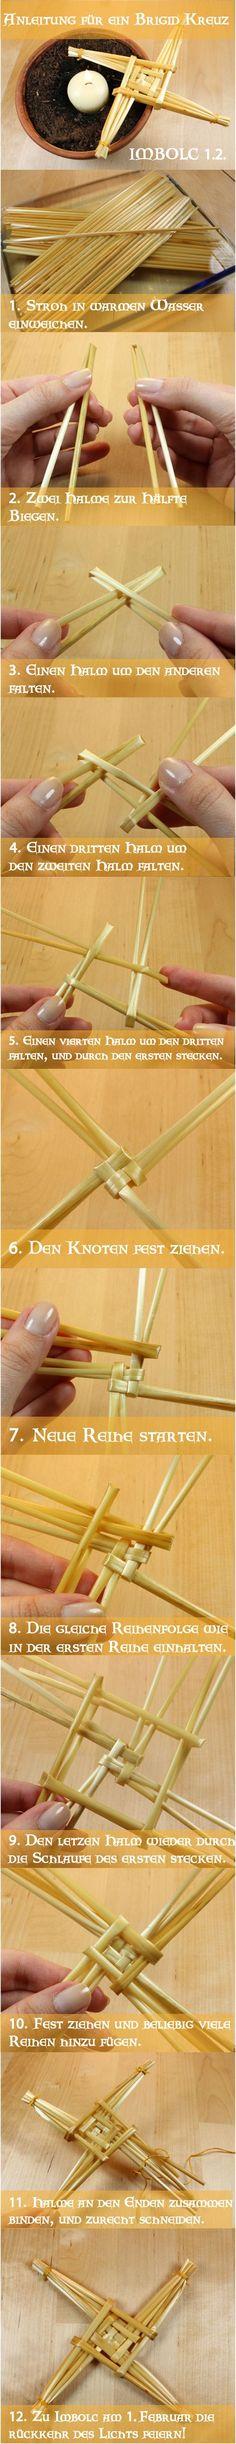 Brigid Kerze - Anleitung Imbolc - Brigid candle DIY: